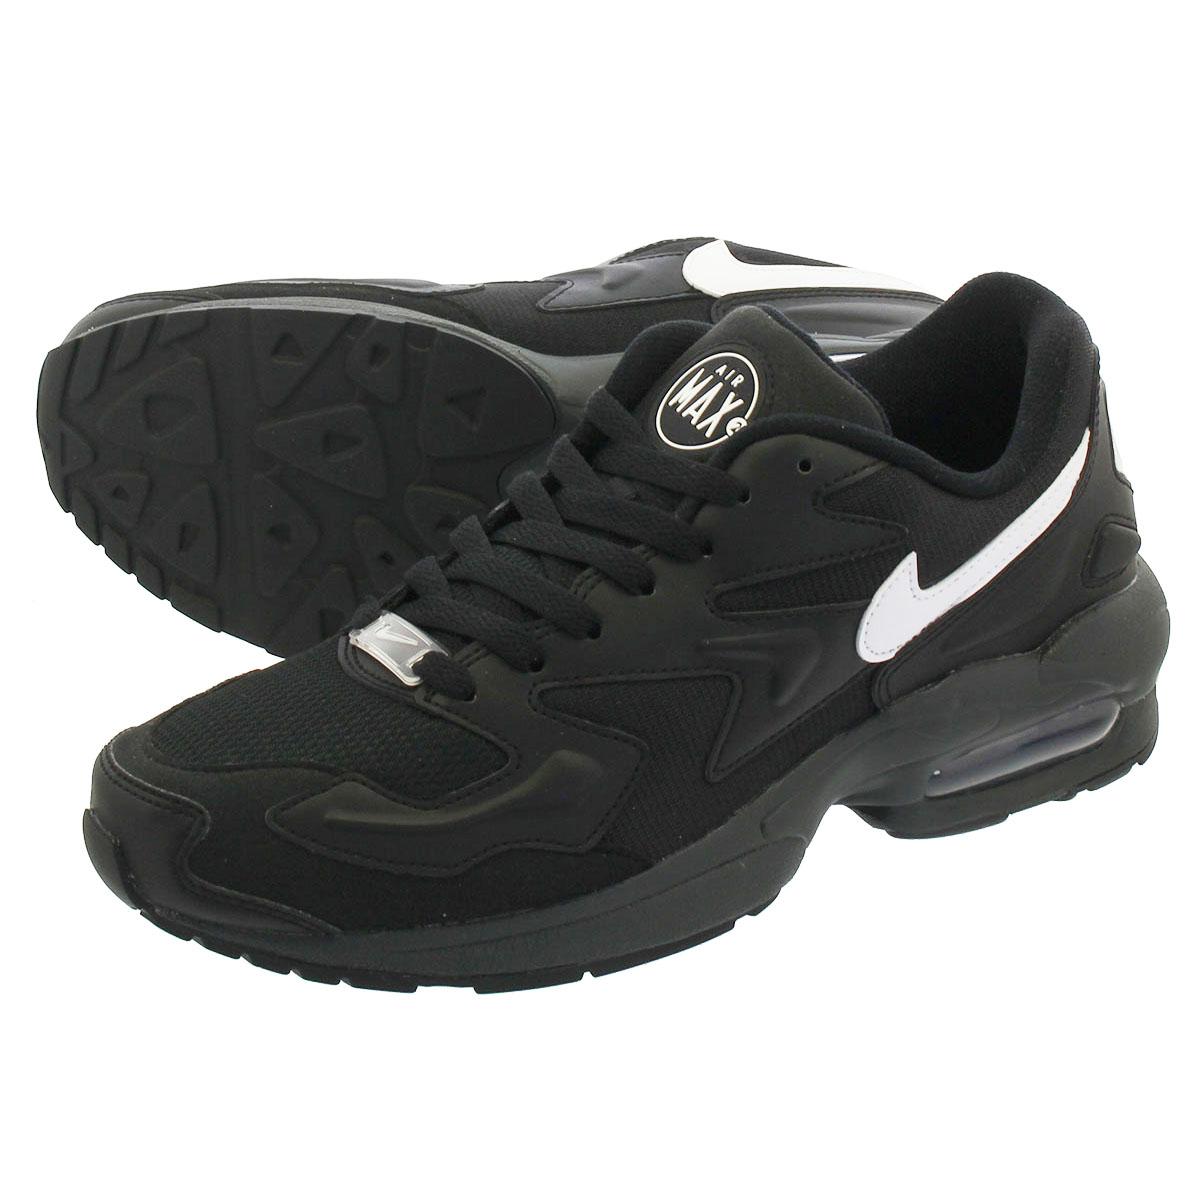 Nike Air Max 2 Light (Black Grey)